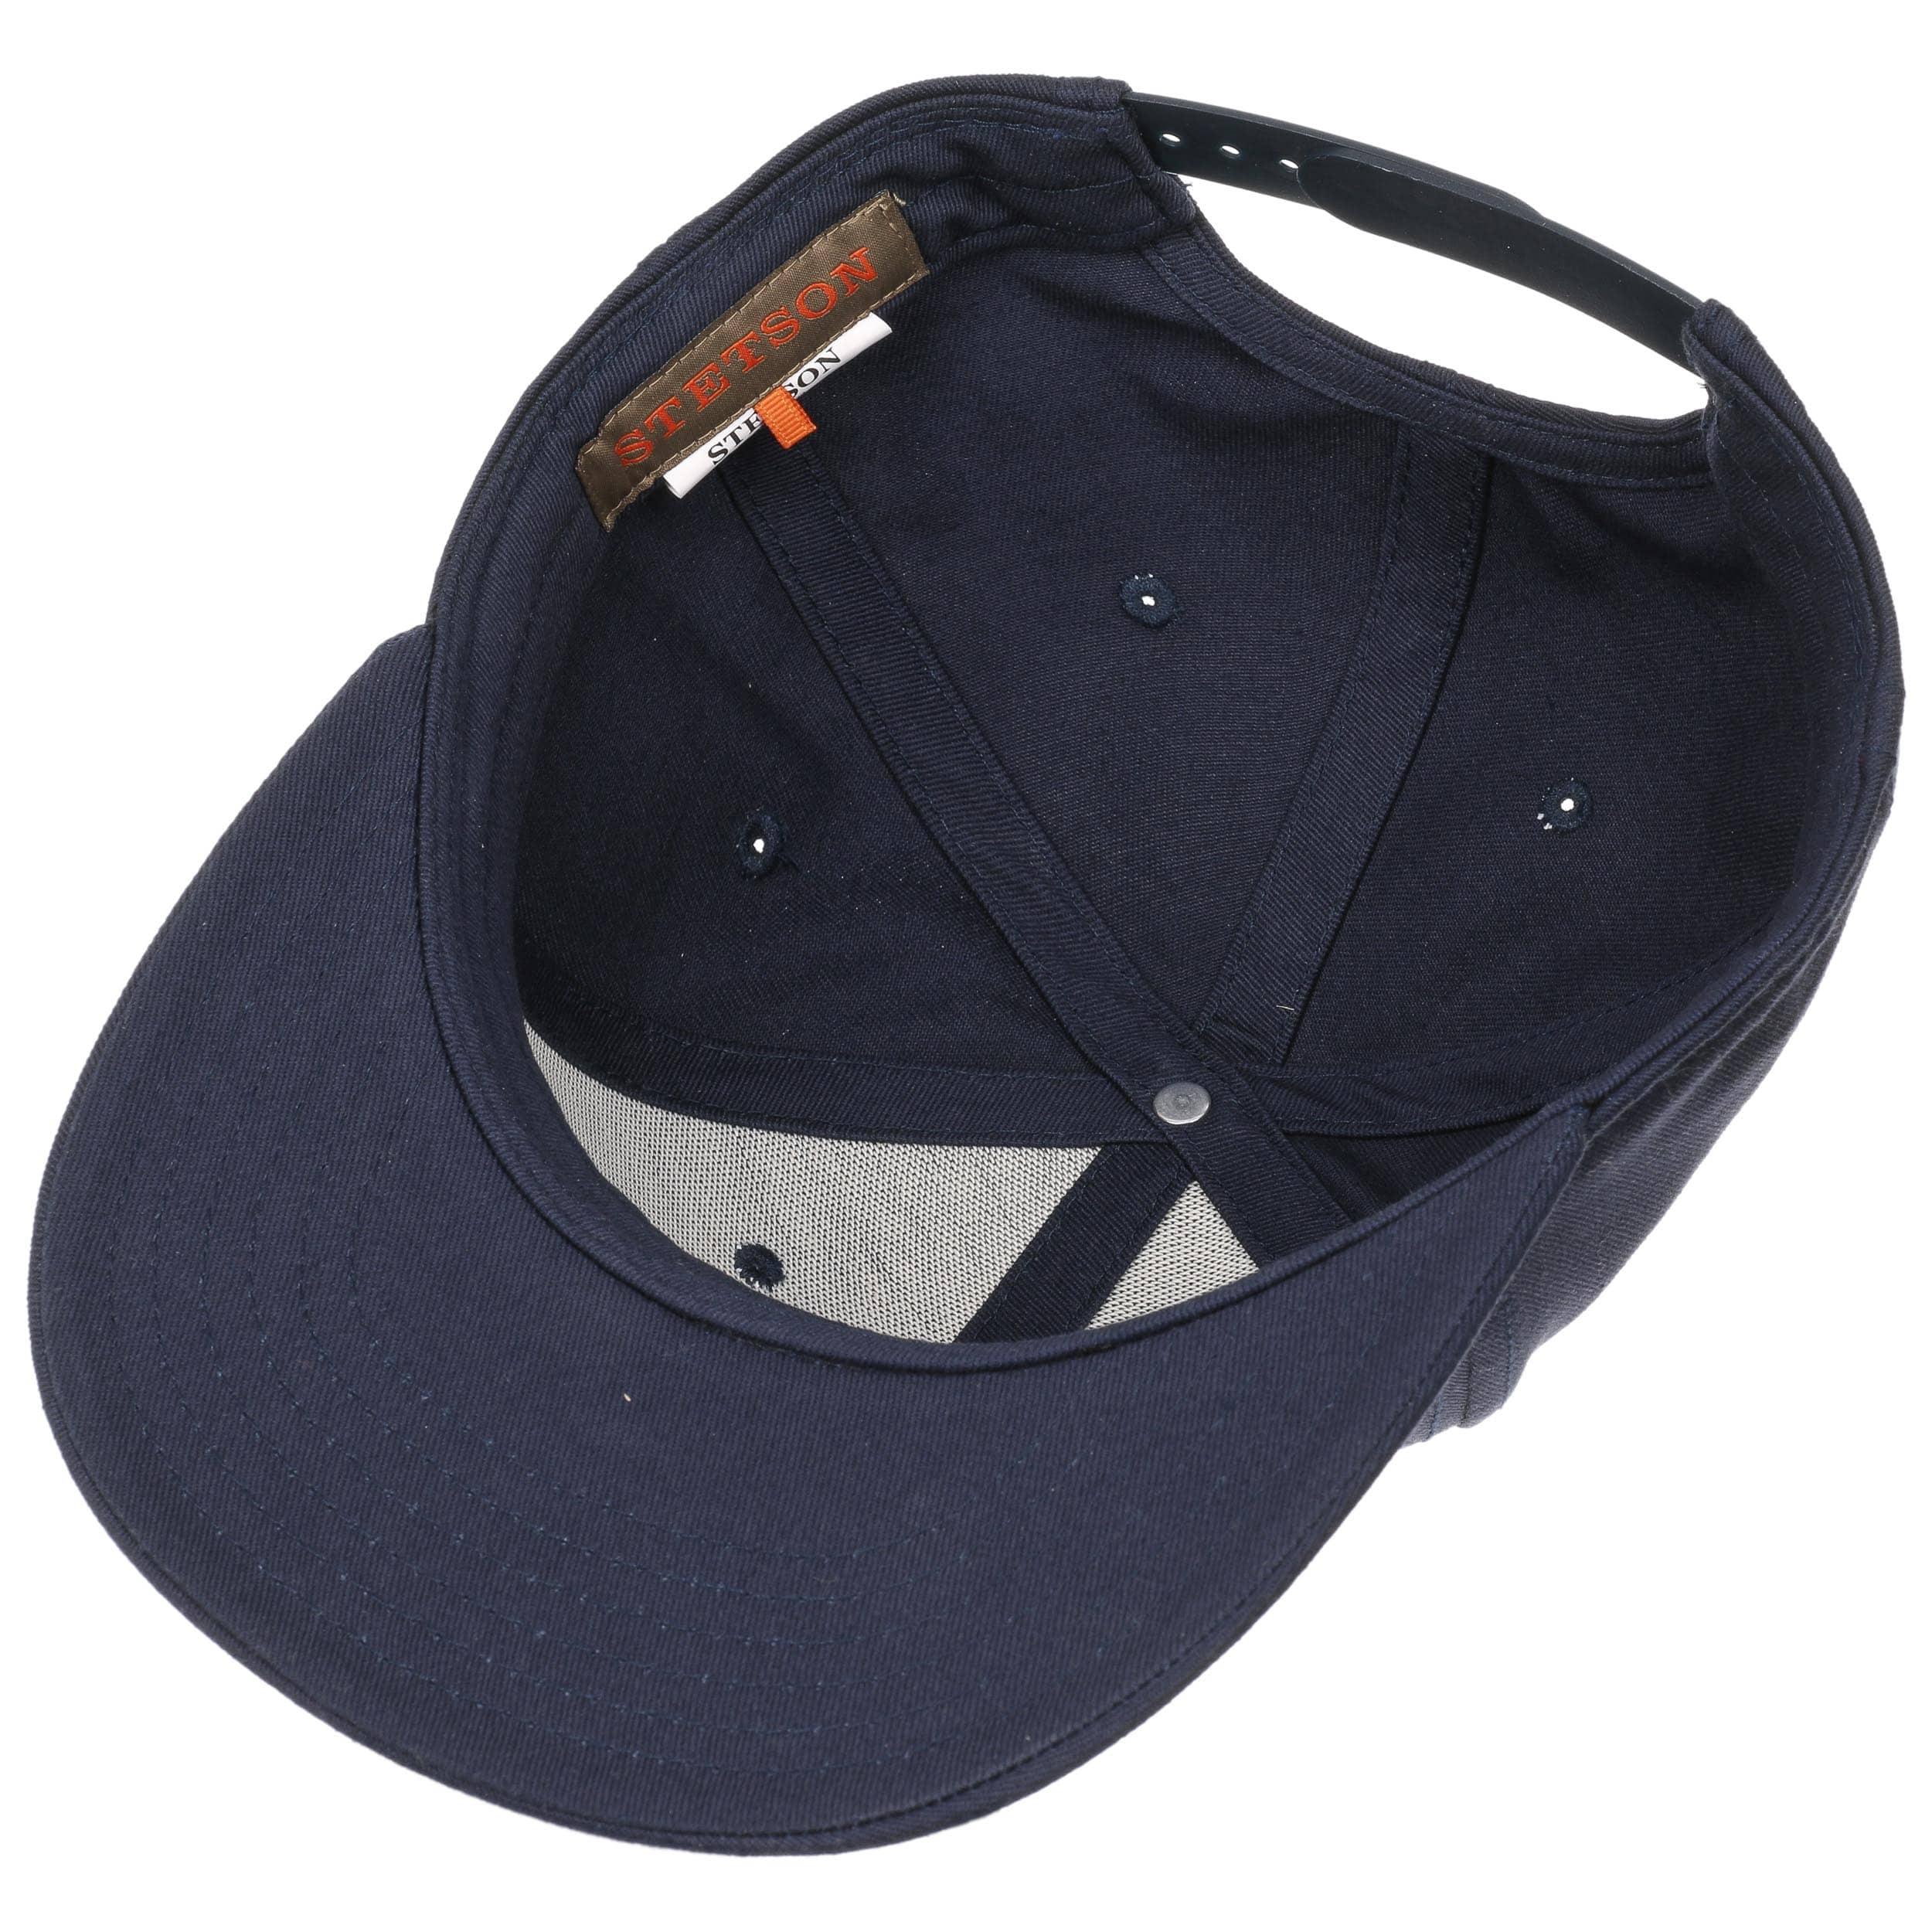 ... Capital S Cotton Baseball Cap by Stetson - 2 ... f70c5e0053e